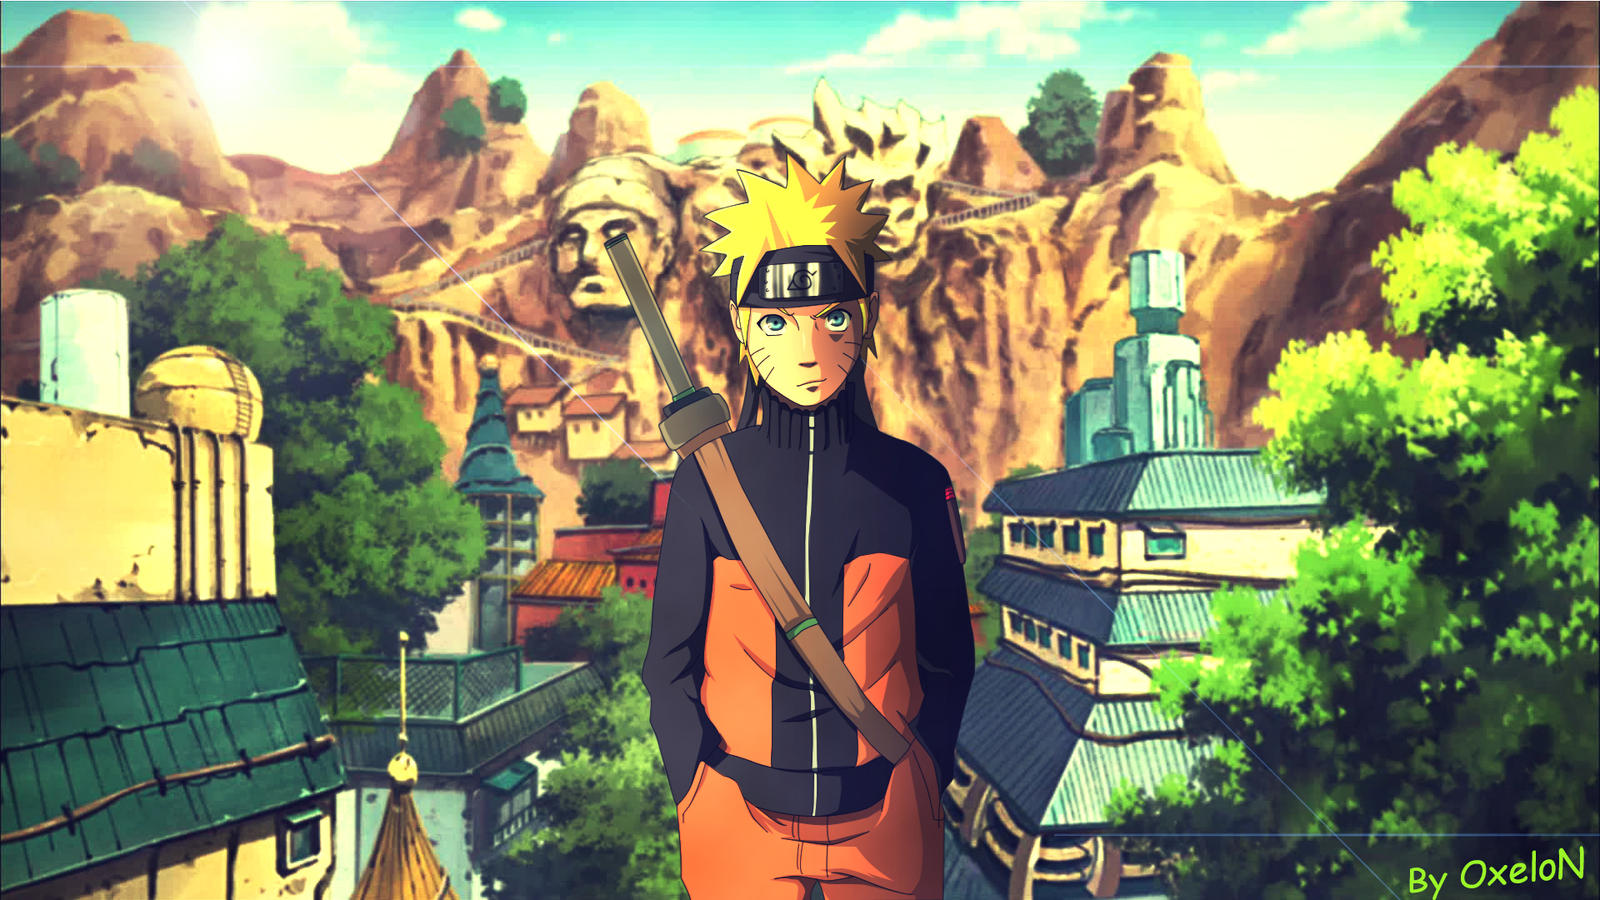 Naruto Shippuuden - Naruto Konoha (Wallpaper) by OxeloN on DeviantArt